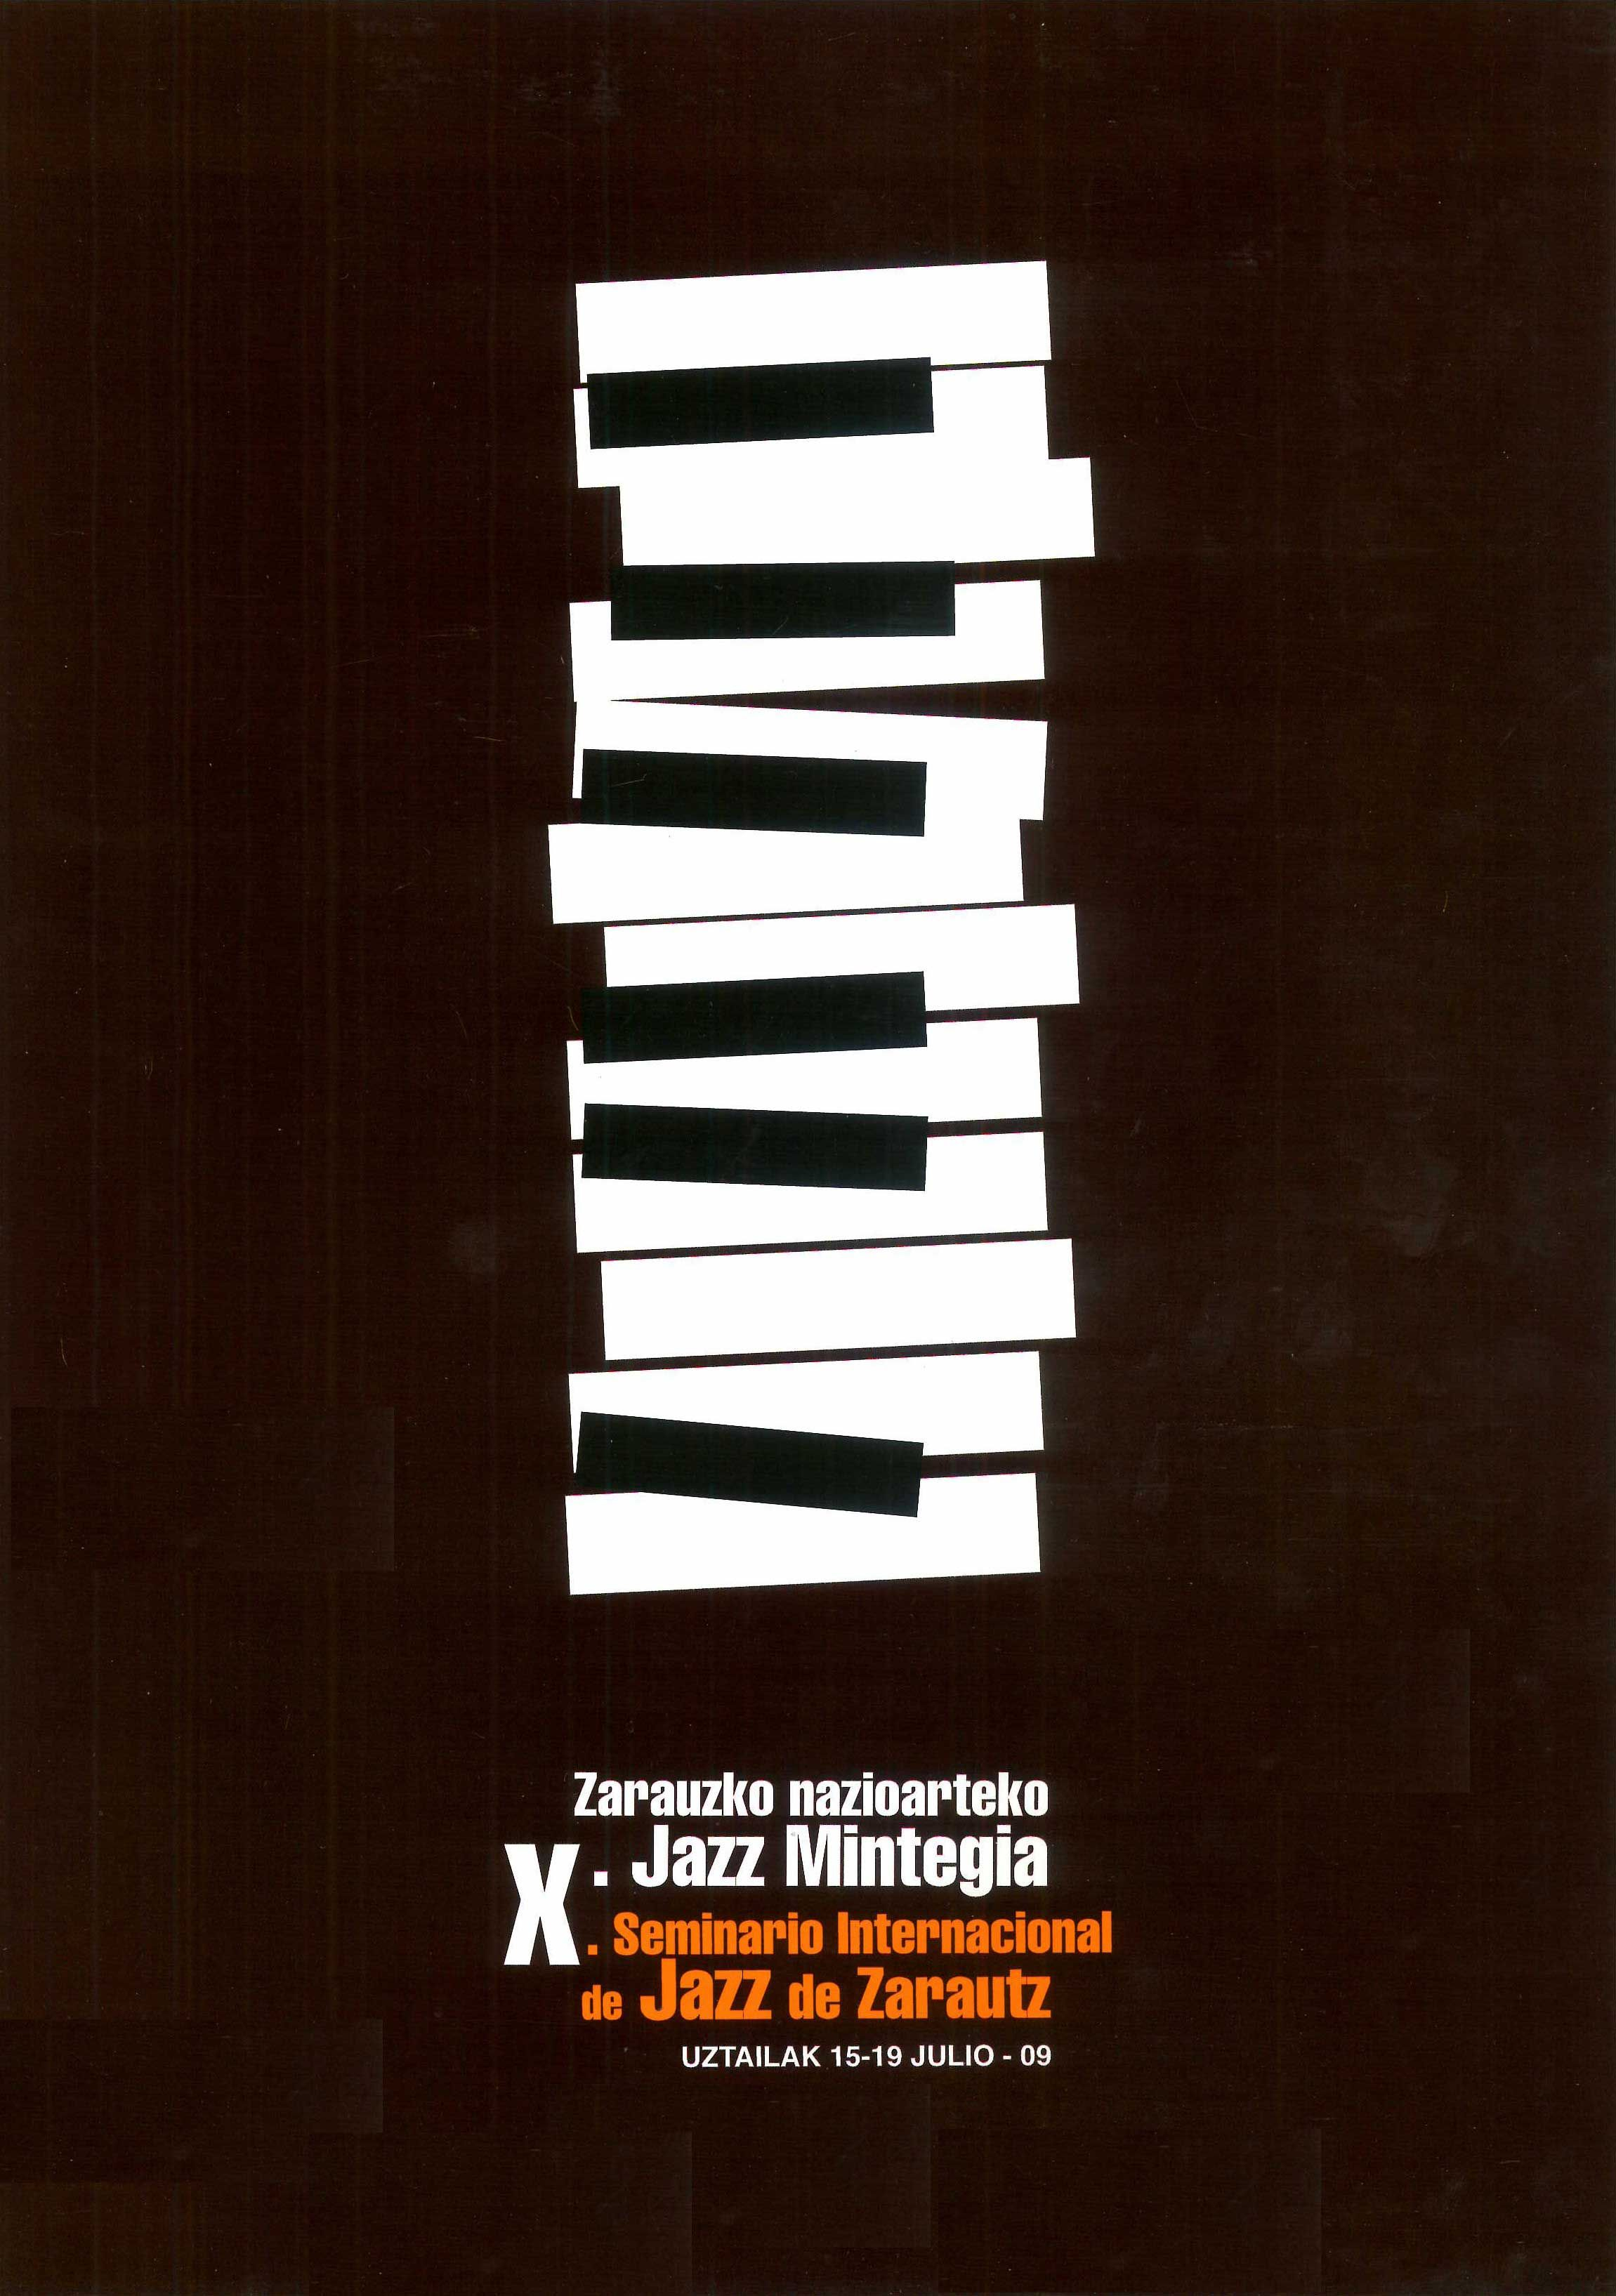 CARTELES JAZZ POSTERS (5) | post-.-iches | Pinterest | Jazz, Google ...